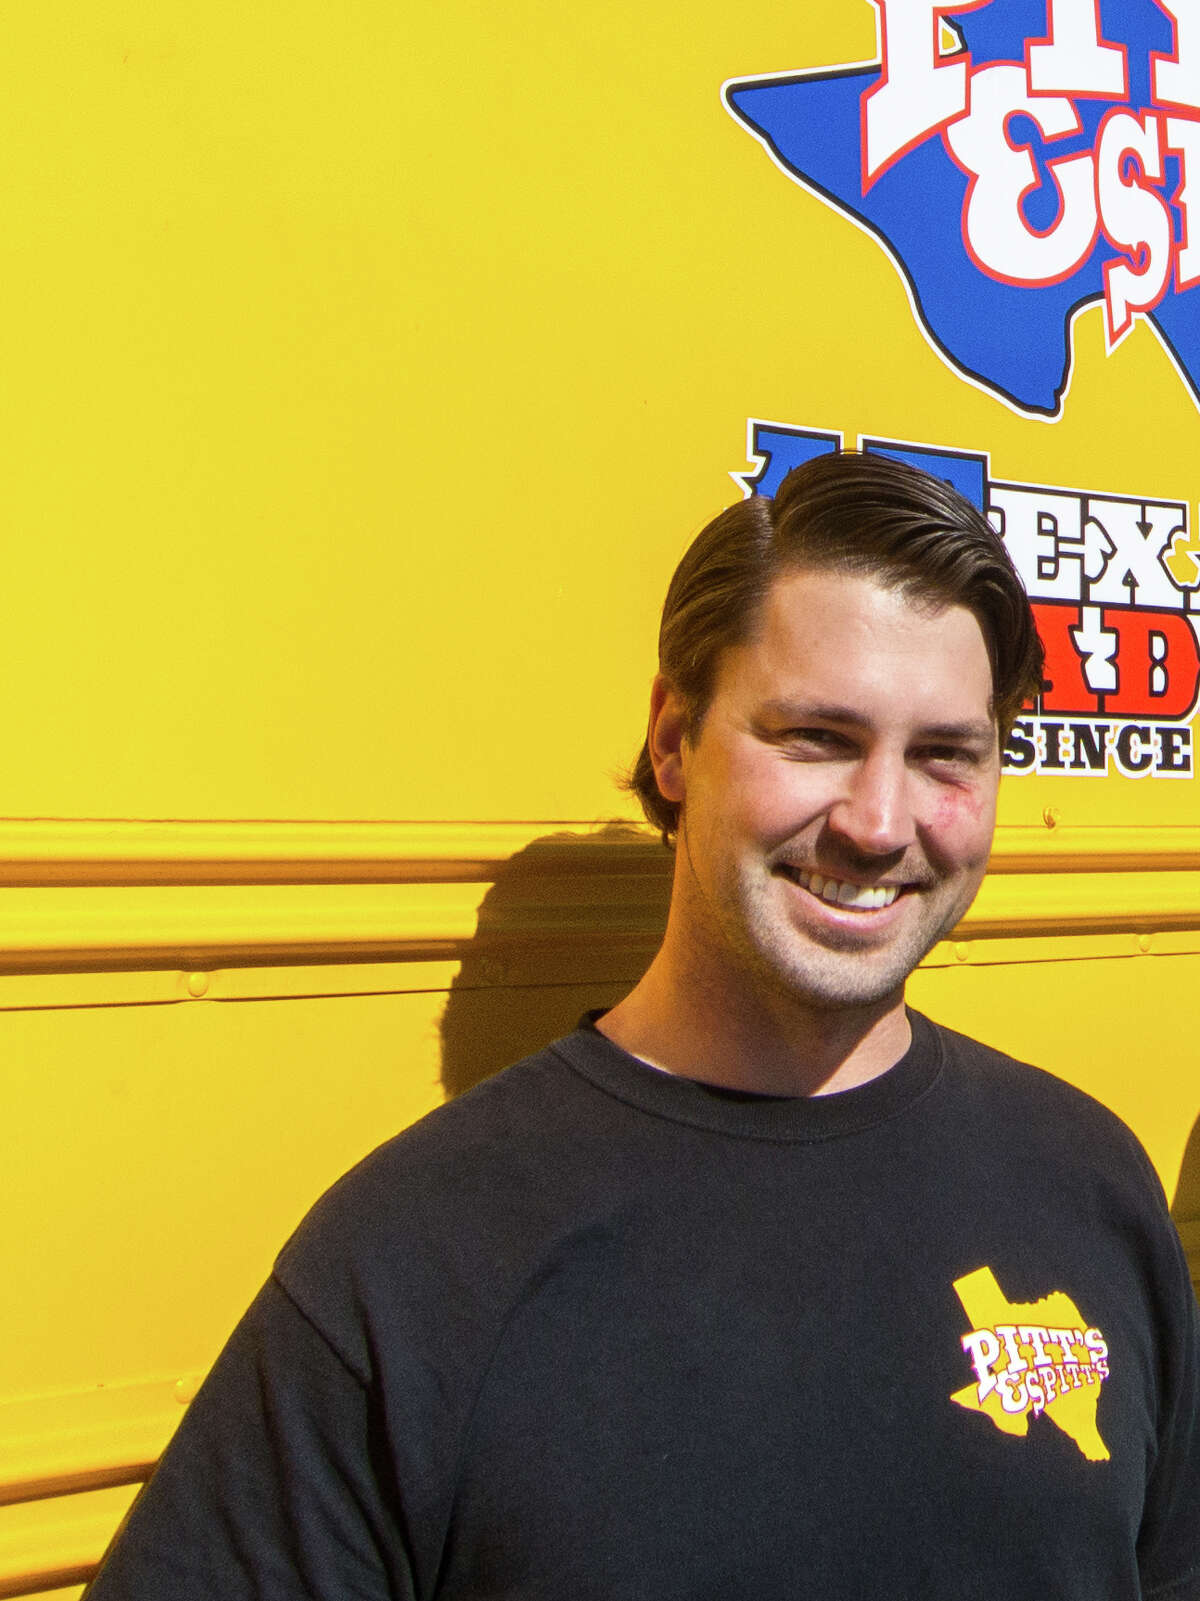 Ryan Zboril of the Pitt's & Spitt's barbecue cooker company.